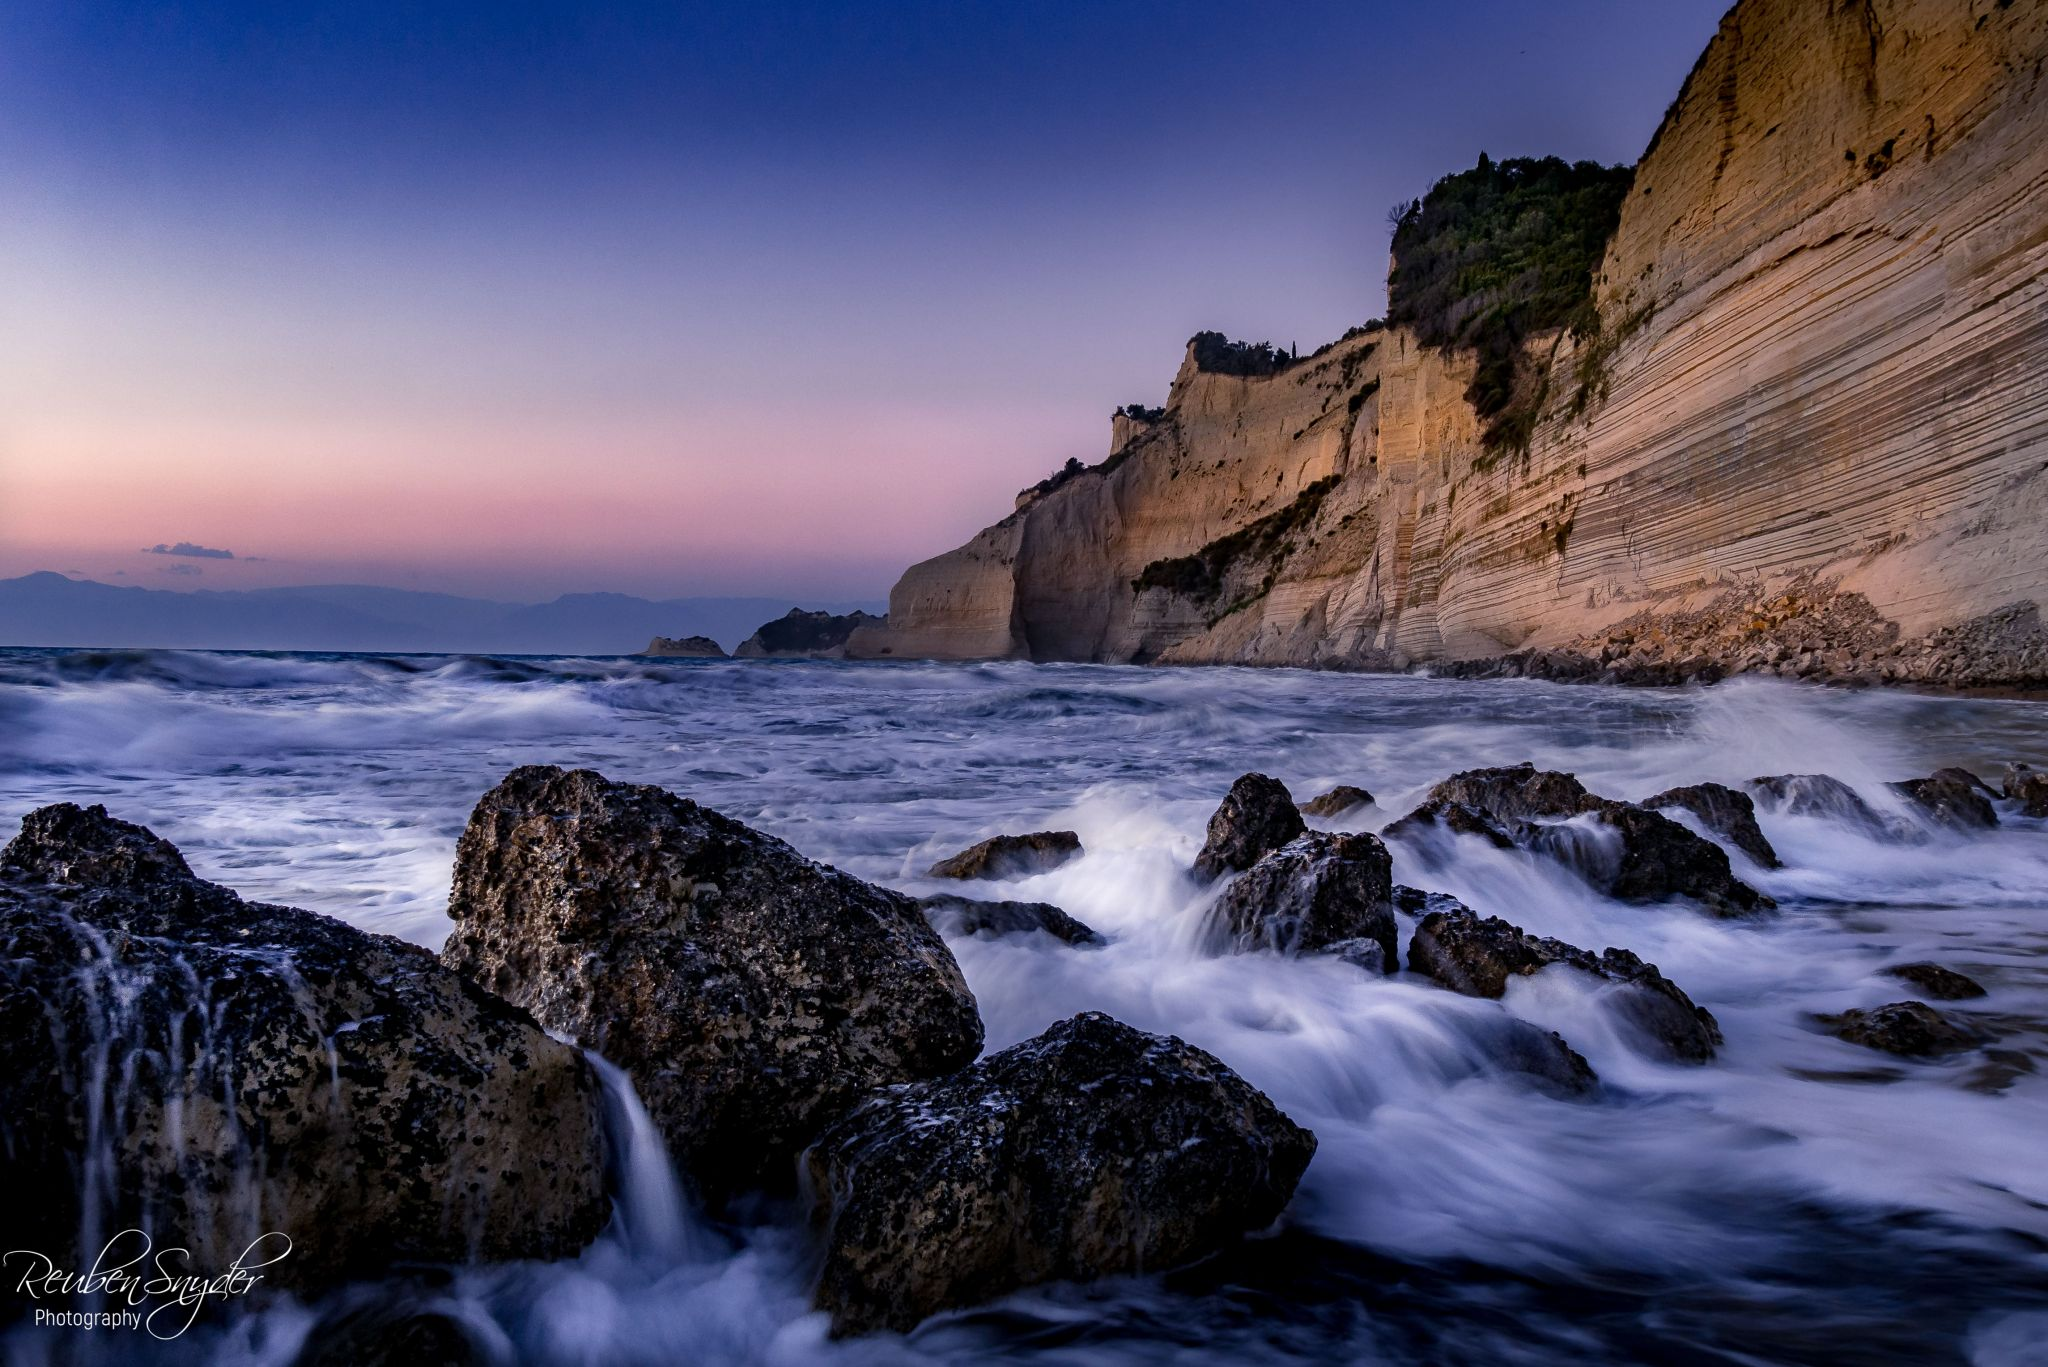 Loggas beach, Greece